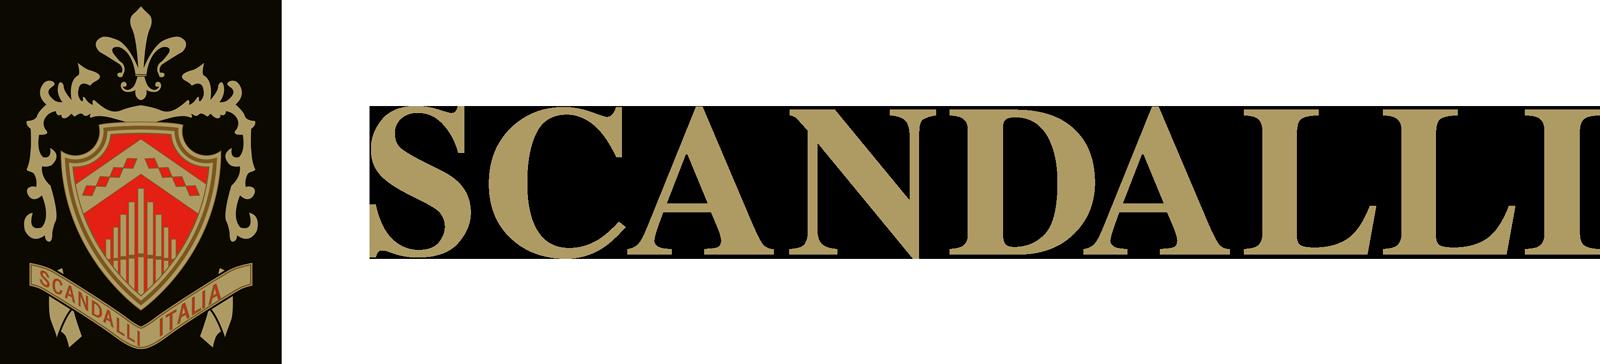 scandalli.com